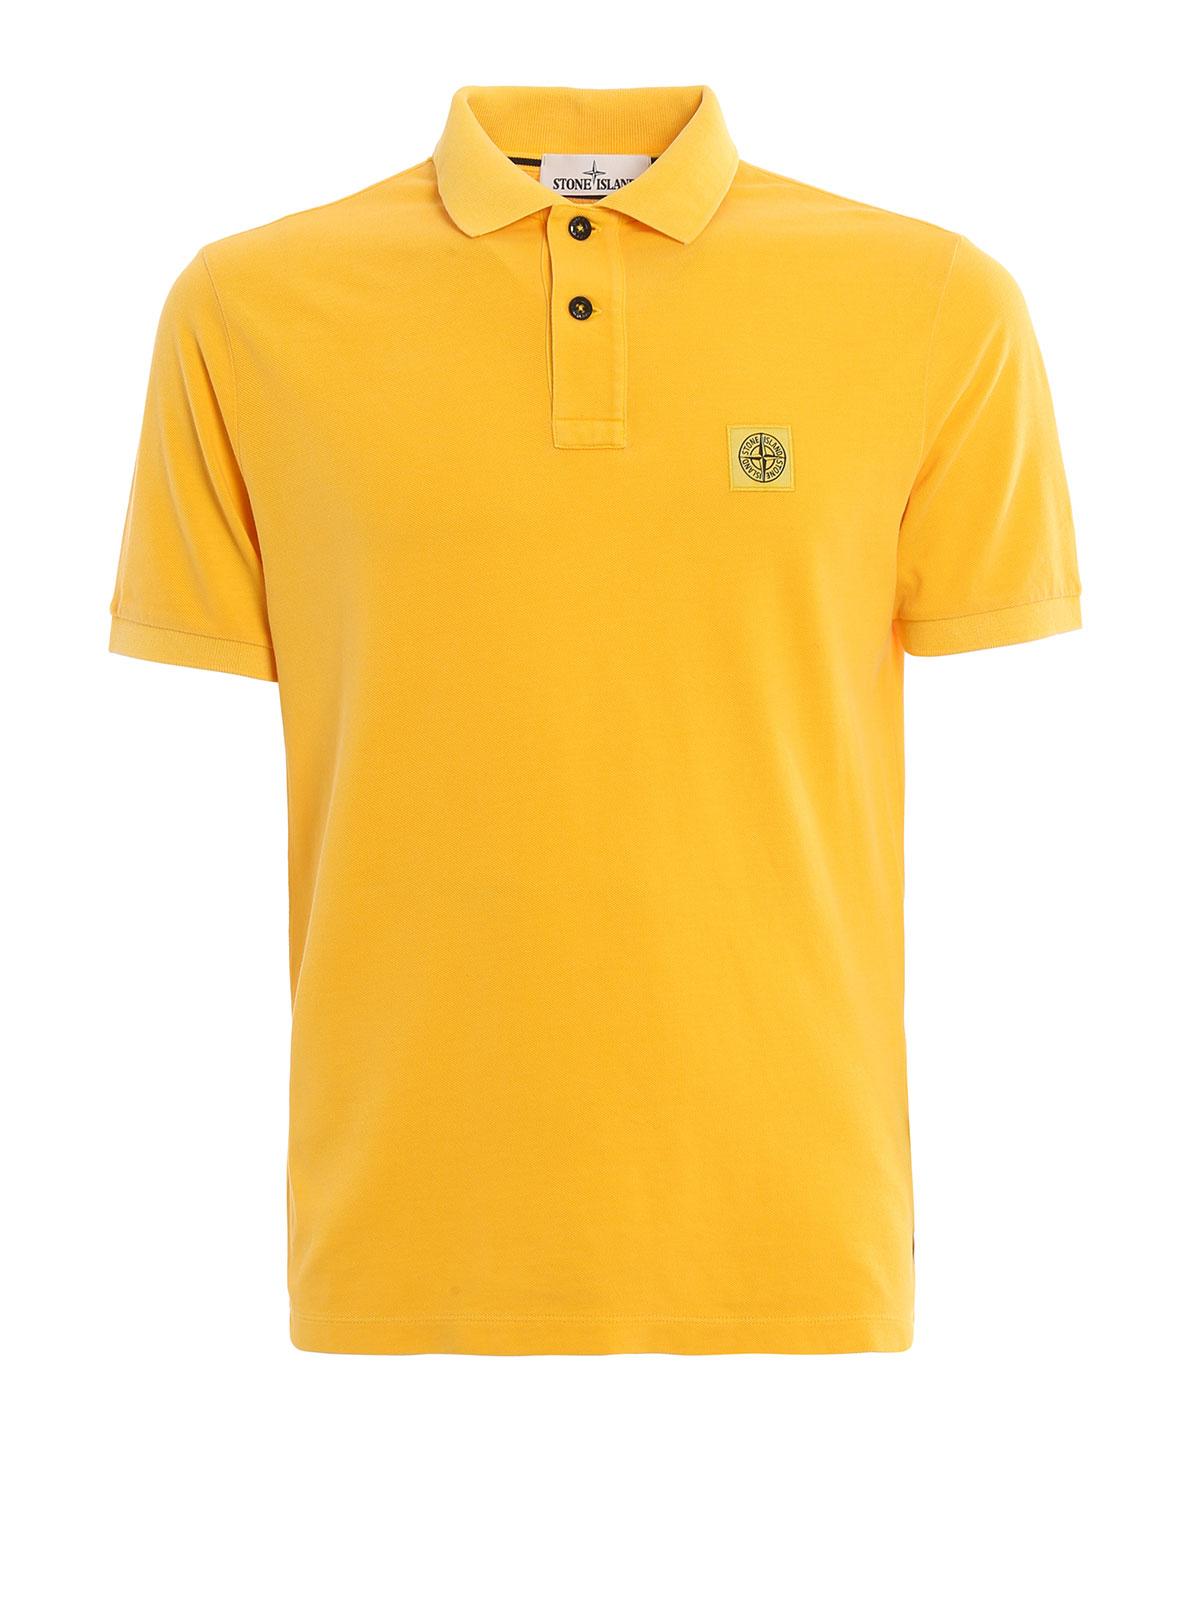 Cotton pique polo shirt by stone island polo shirts for Cotton on polo shirt